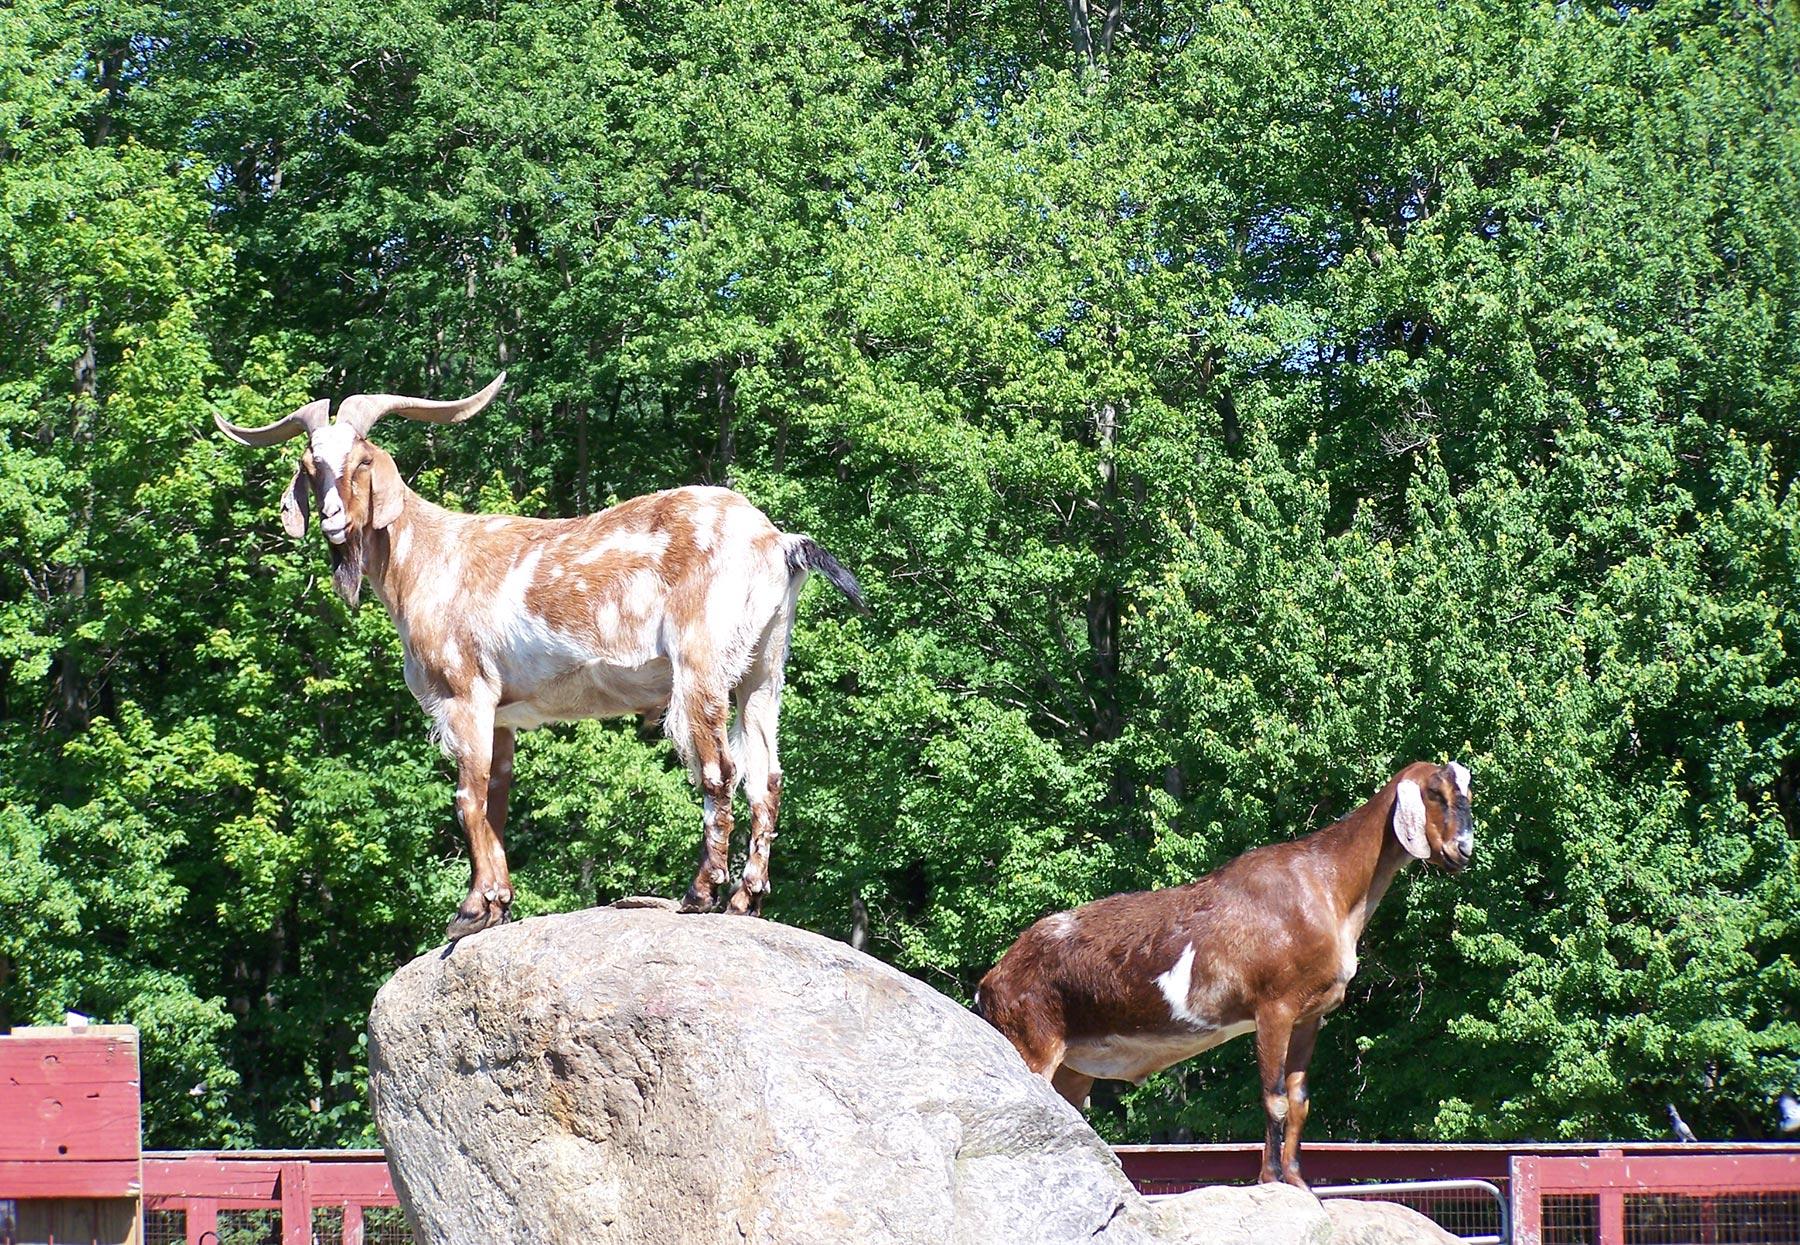 Animal Farm – Silvermans Farm